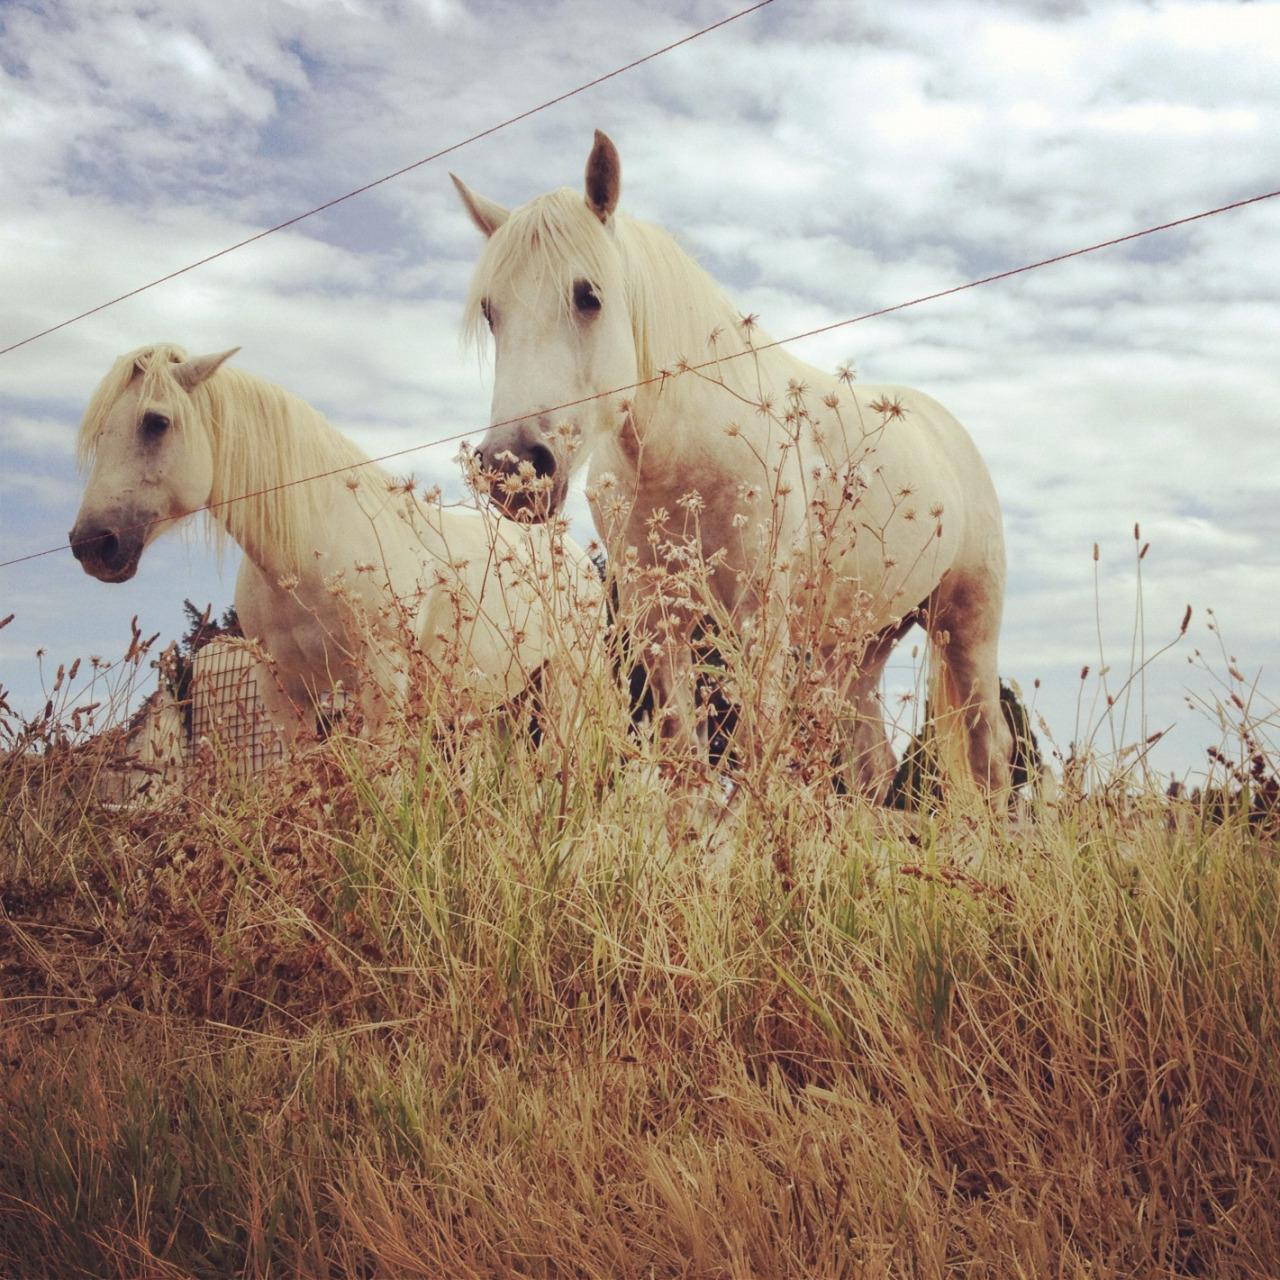 Provencal Horses / July 2012